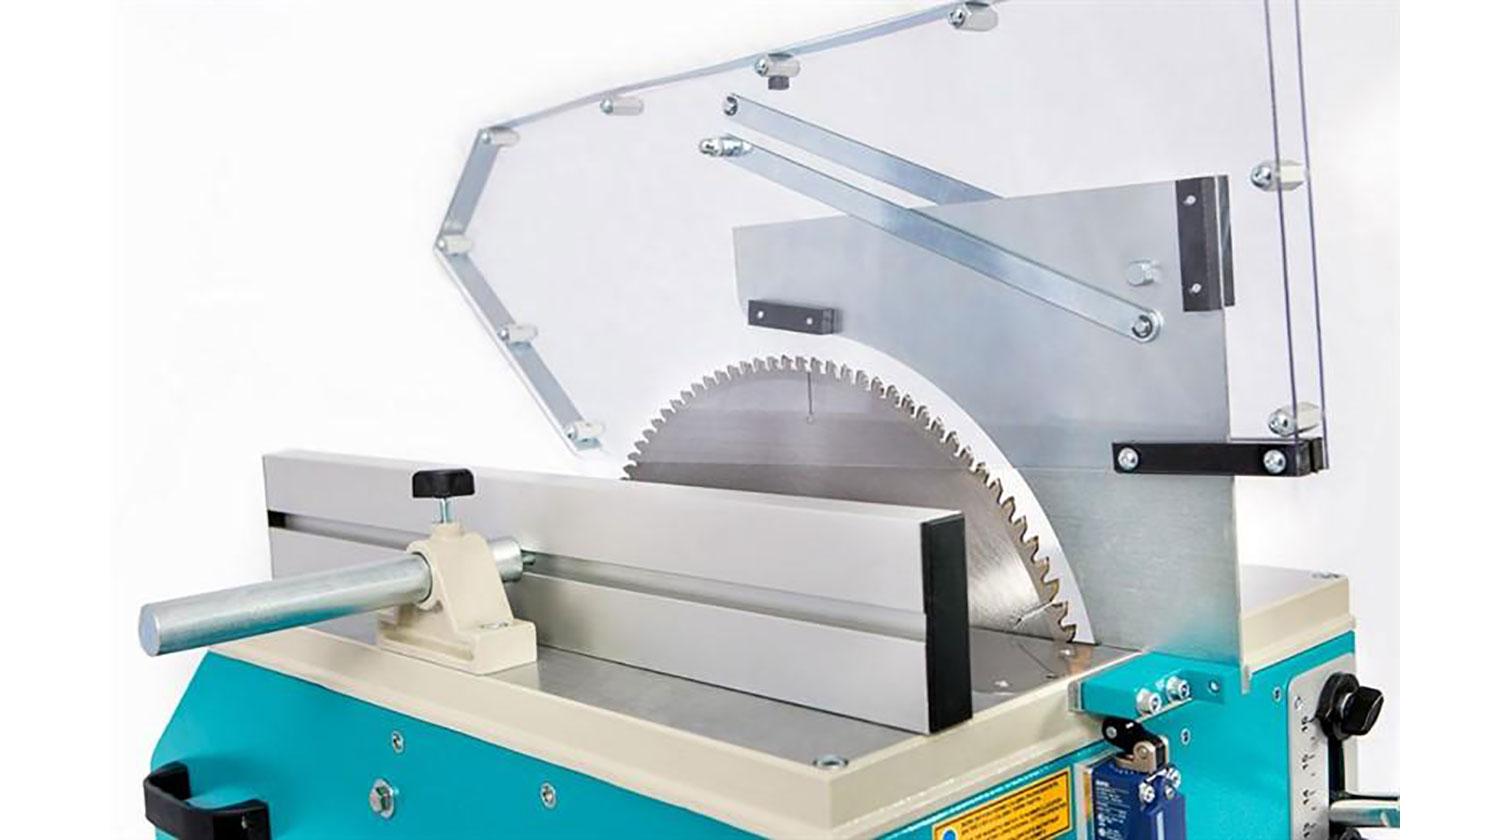 INT aluminum manual up cut saw Yilmaz MK 420 table saw configuration